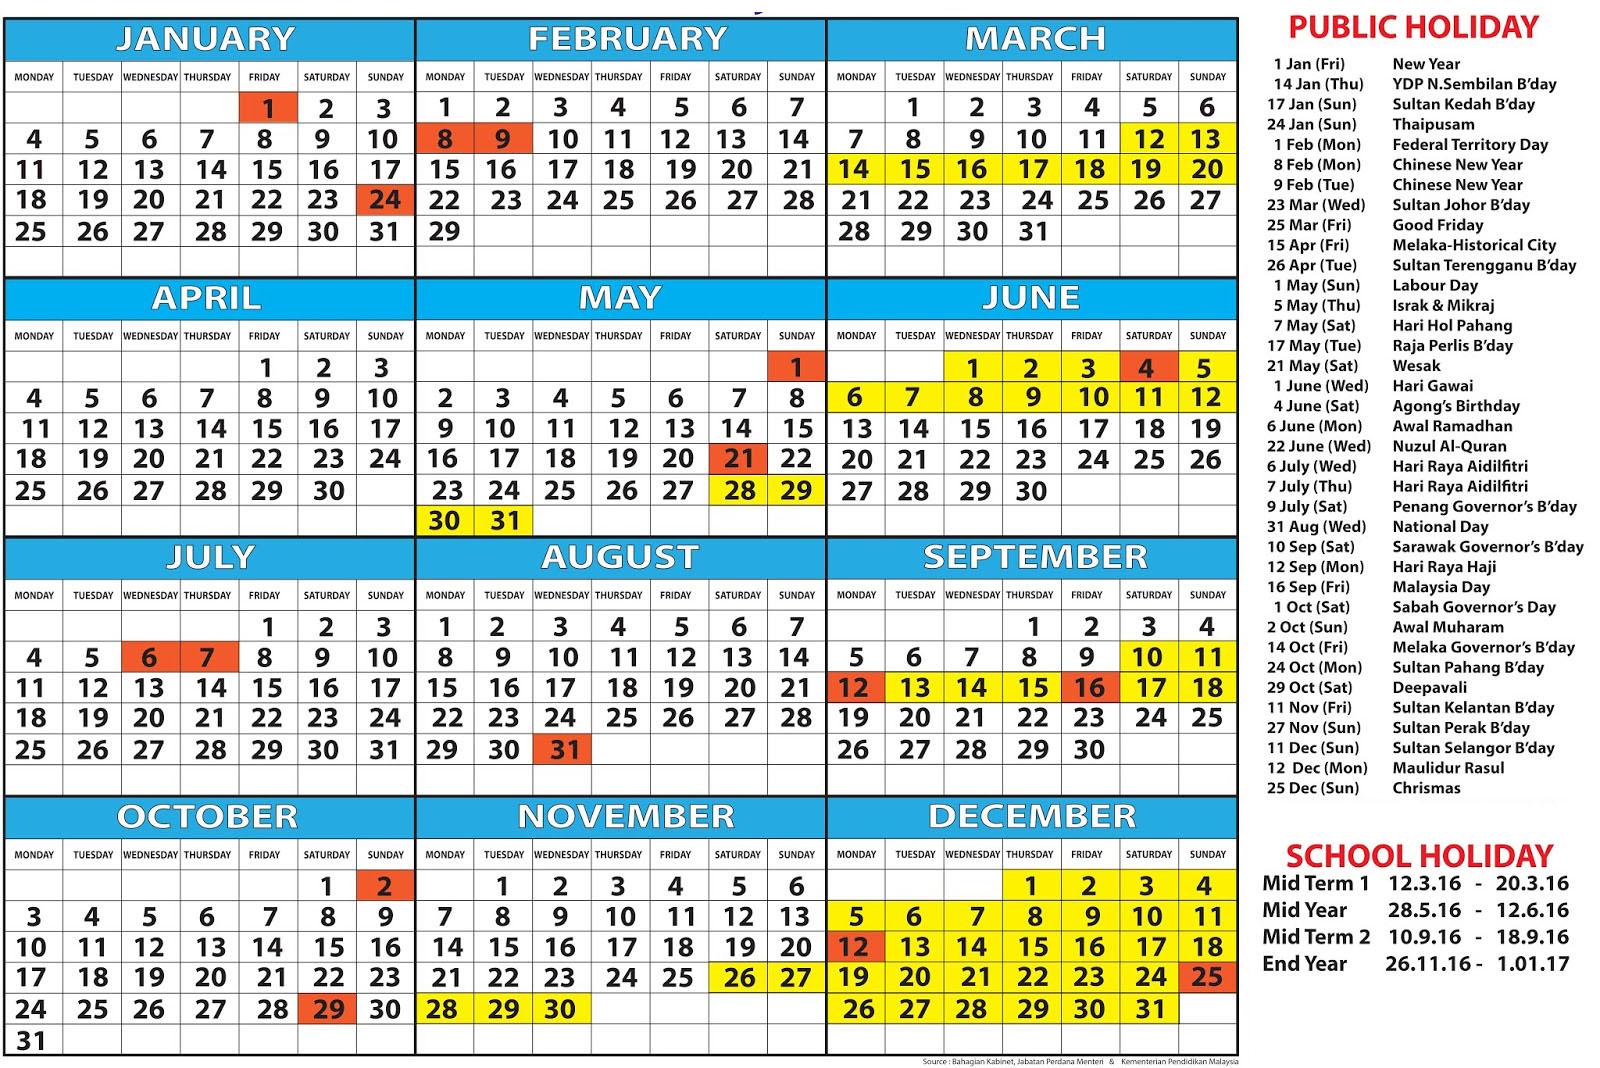 http://www.blueheavendivers.com/BHD/wp-content/uploads/2016/01/Malaisia-calendar-2016.jpg